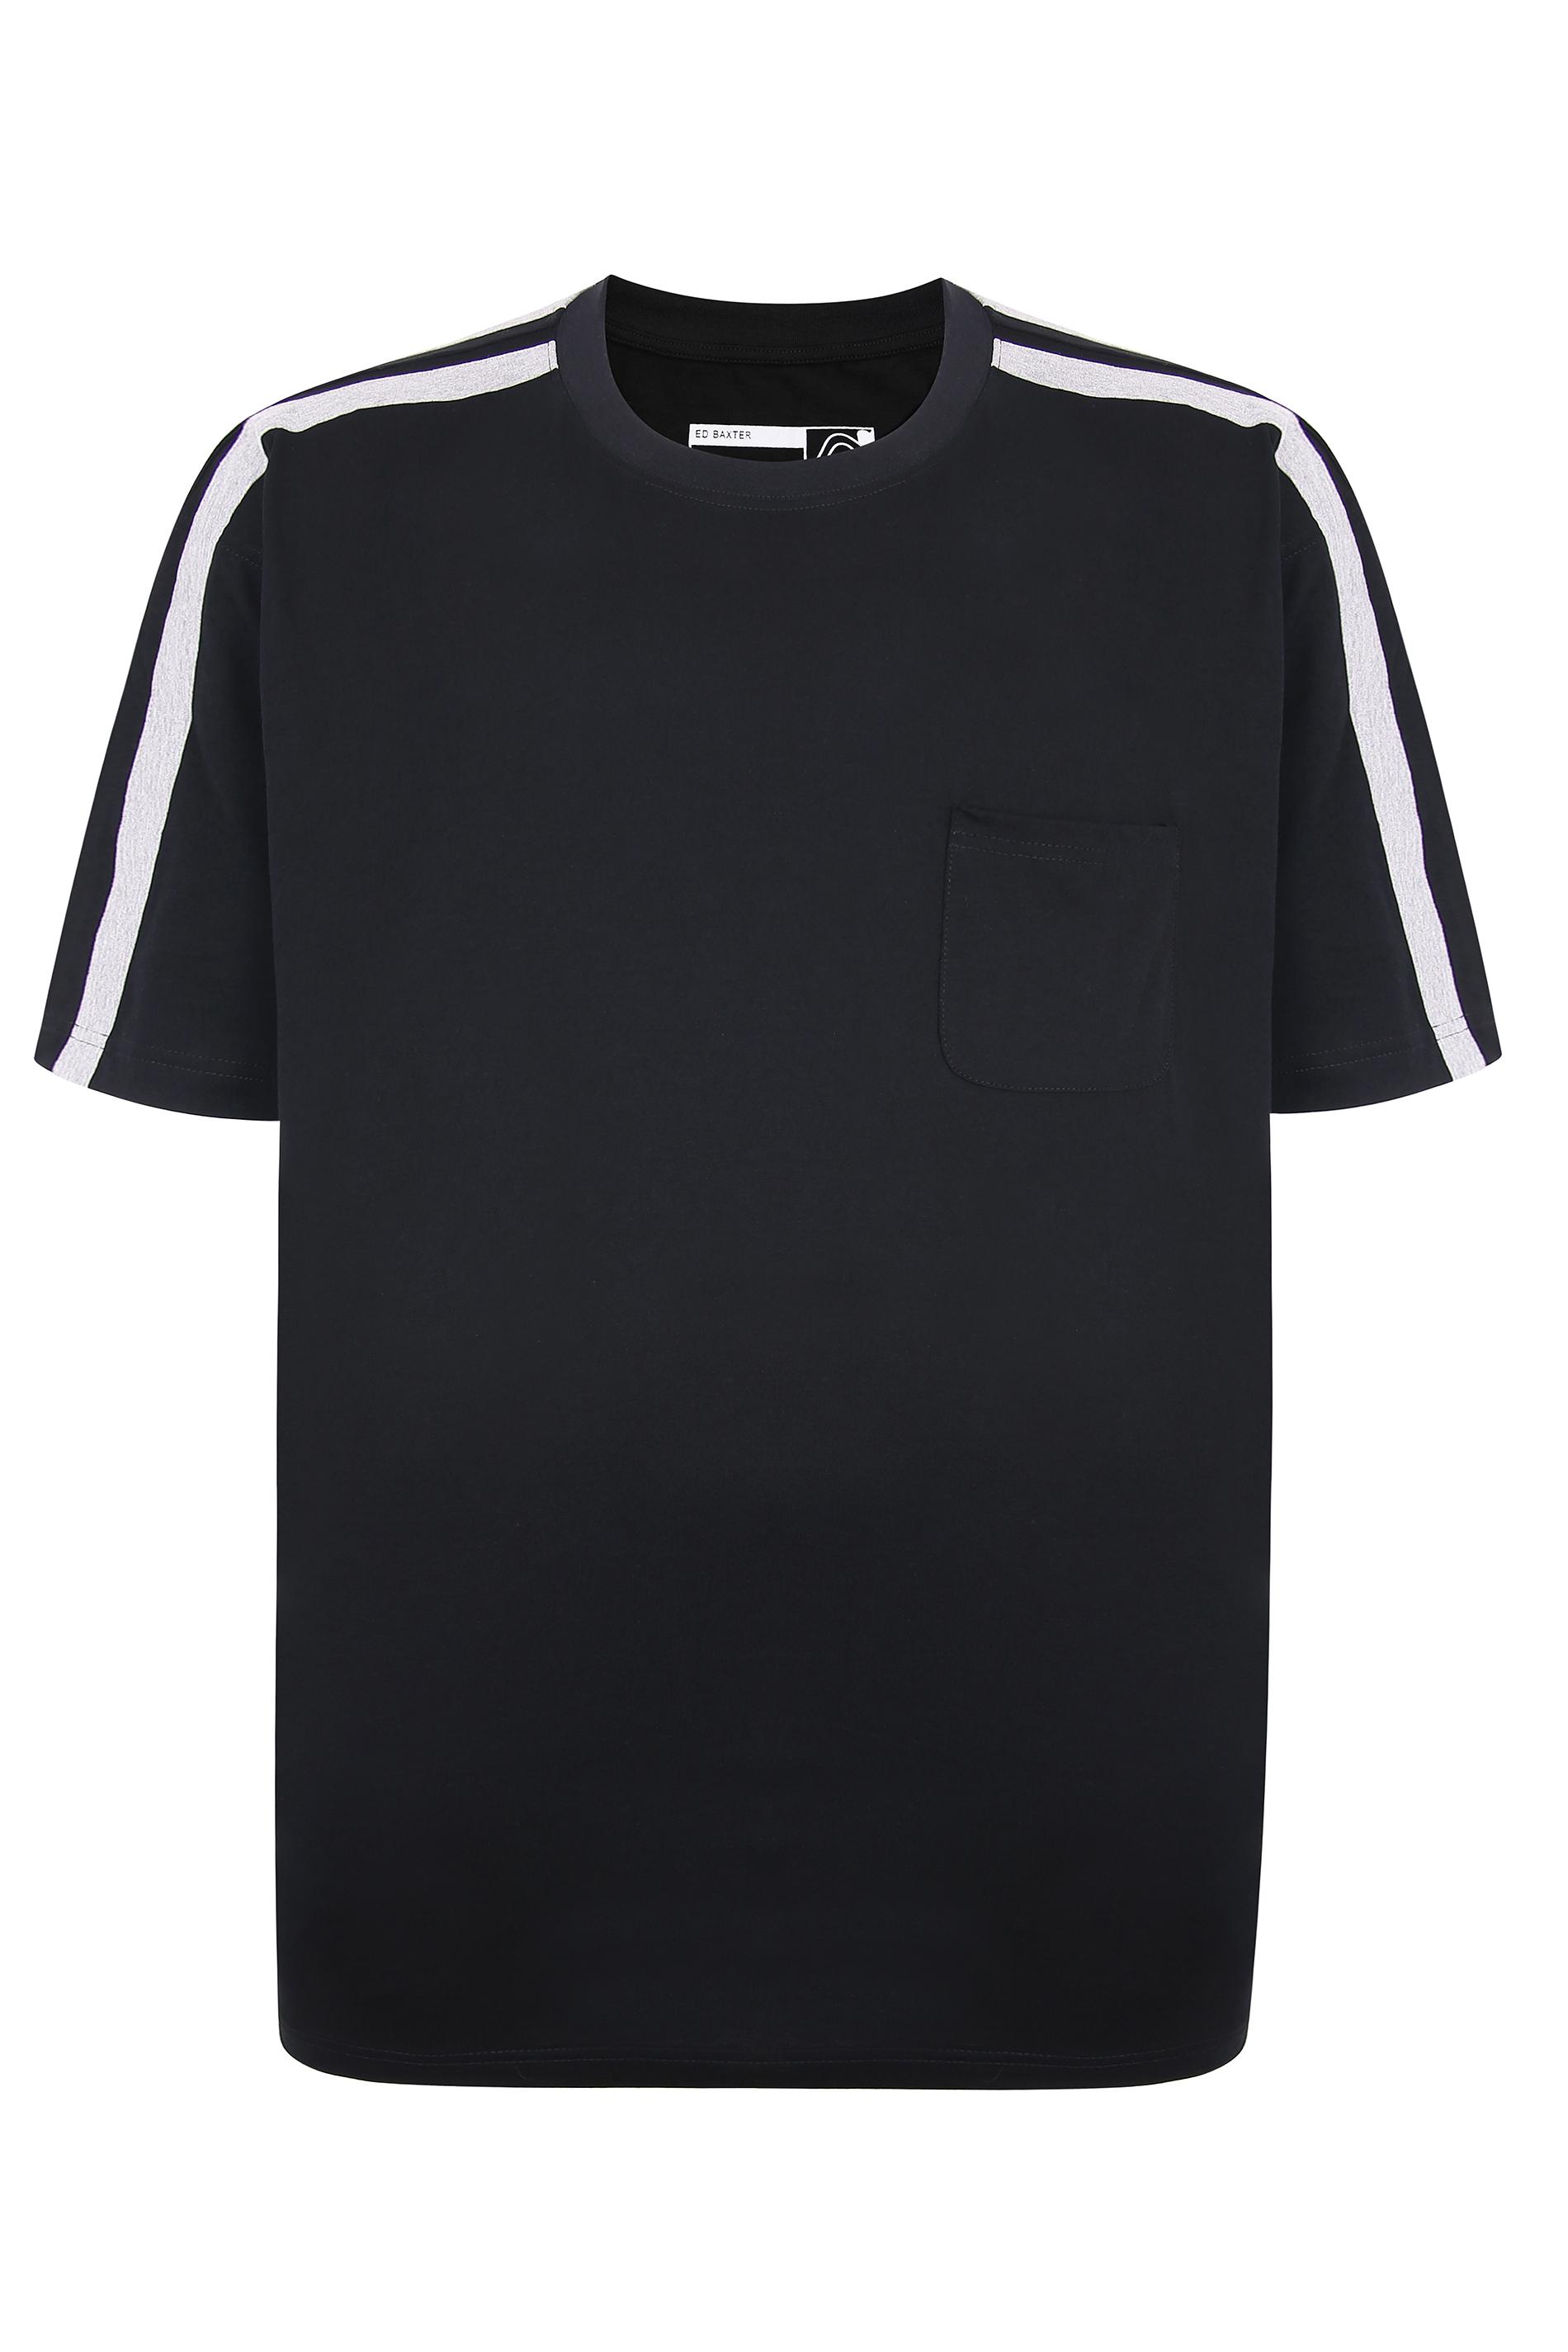 ED BAXTER Black Lounge T-Shirt_F.jpg